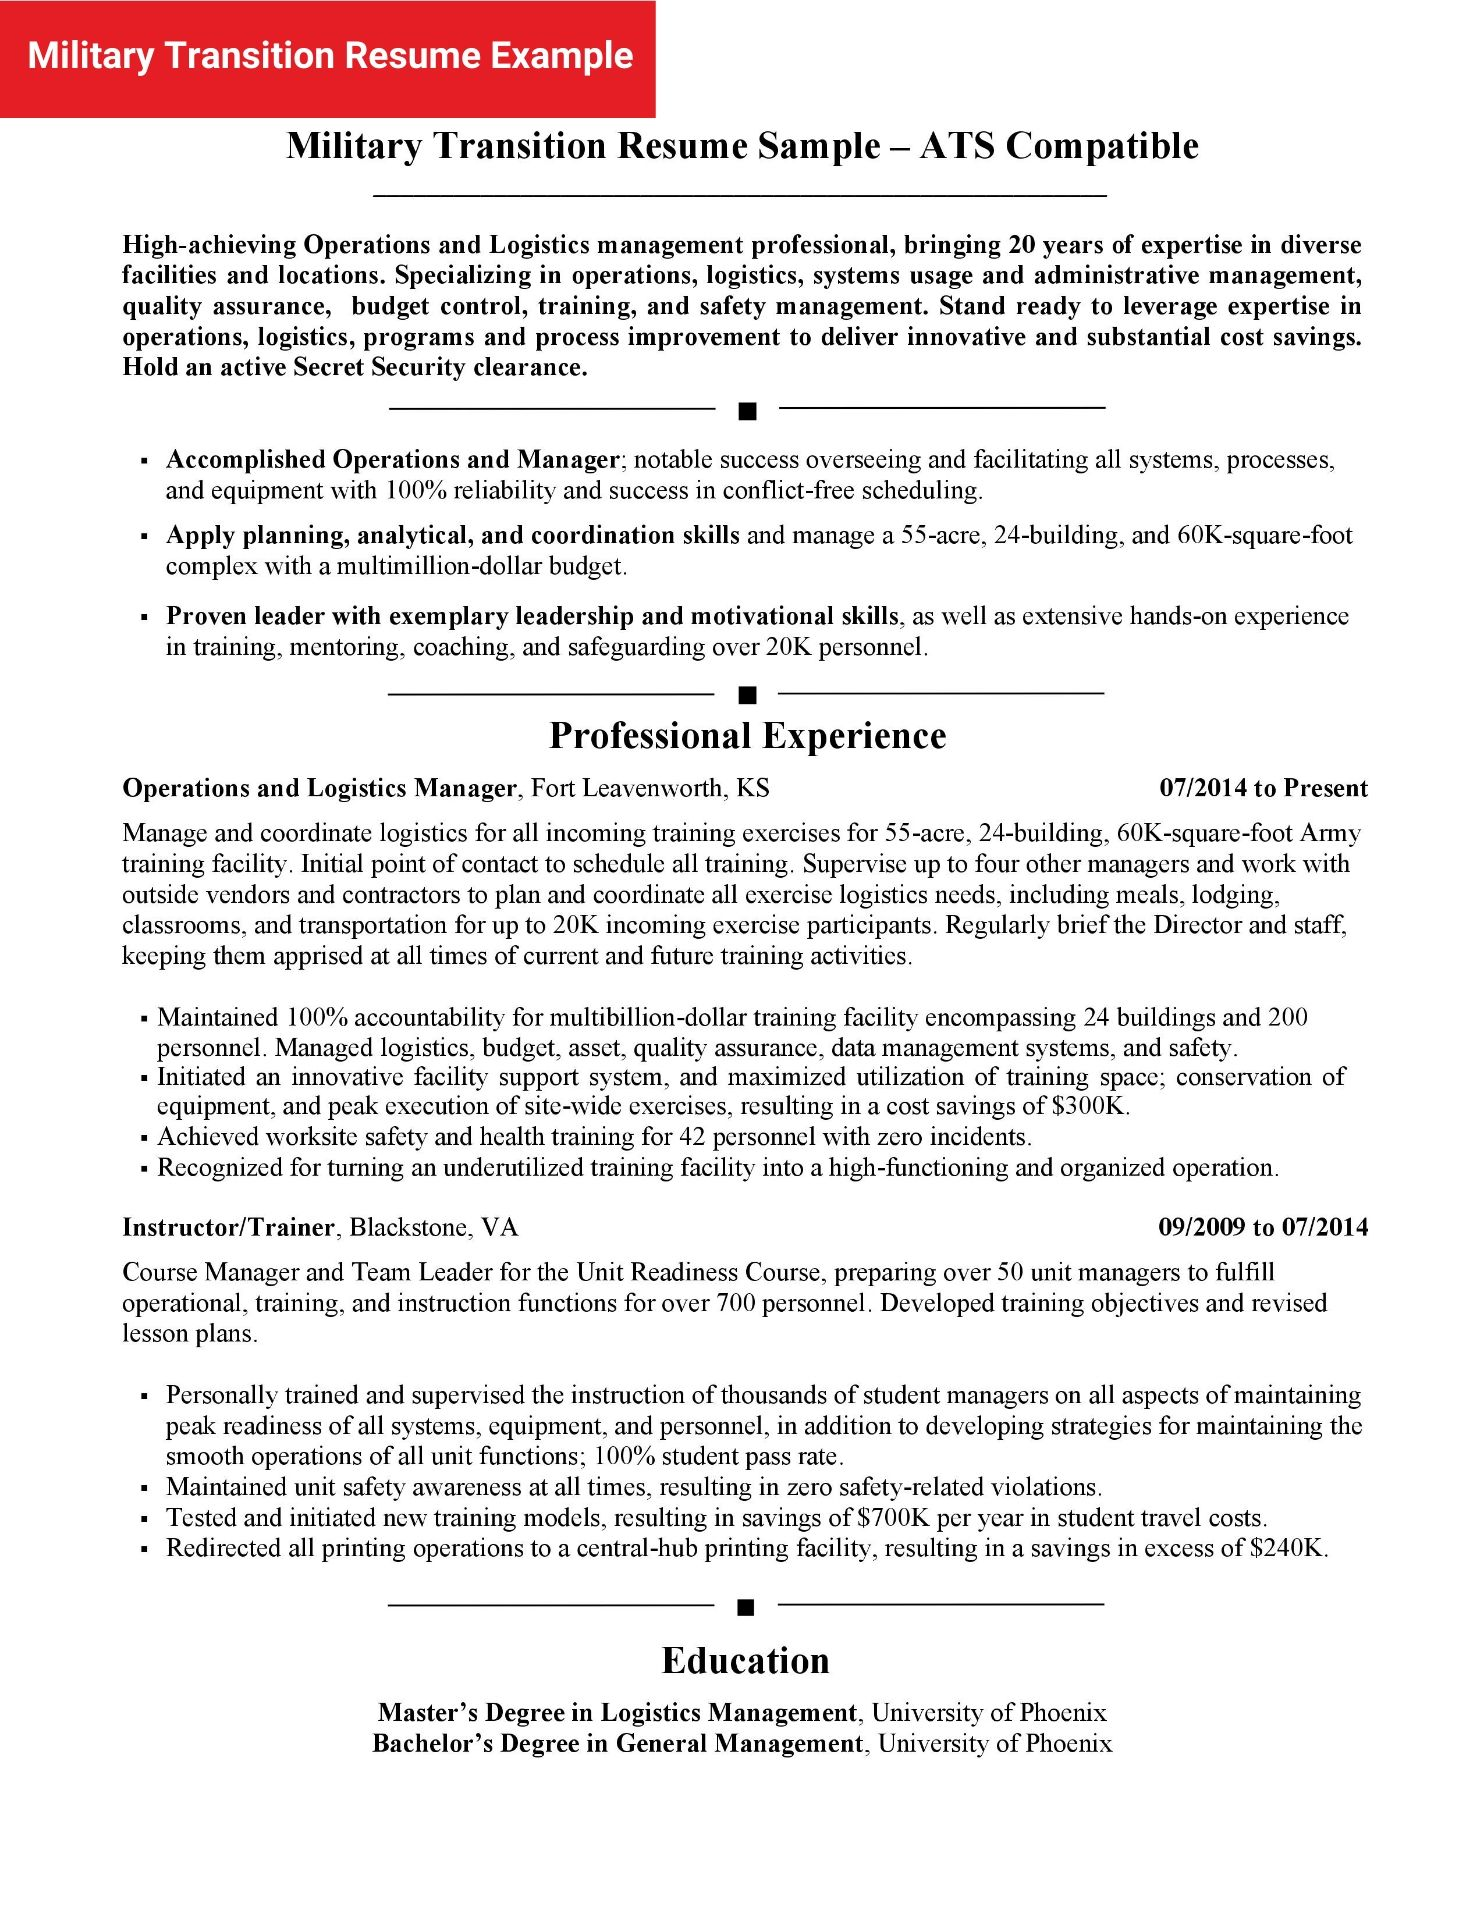 7 free federal resume samples  u0026 more writing tips